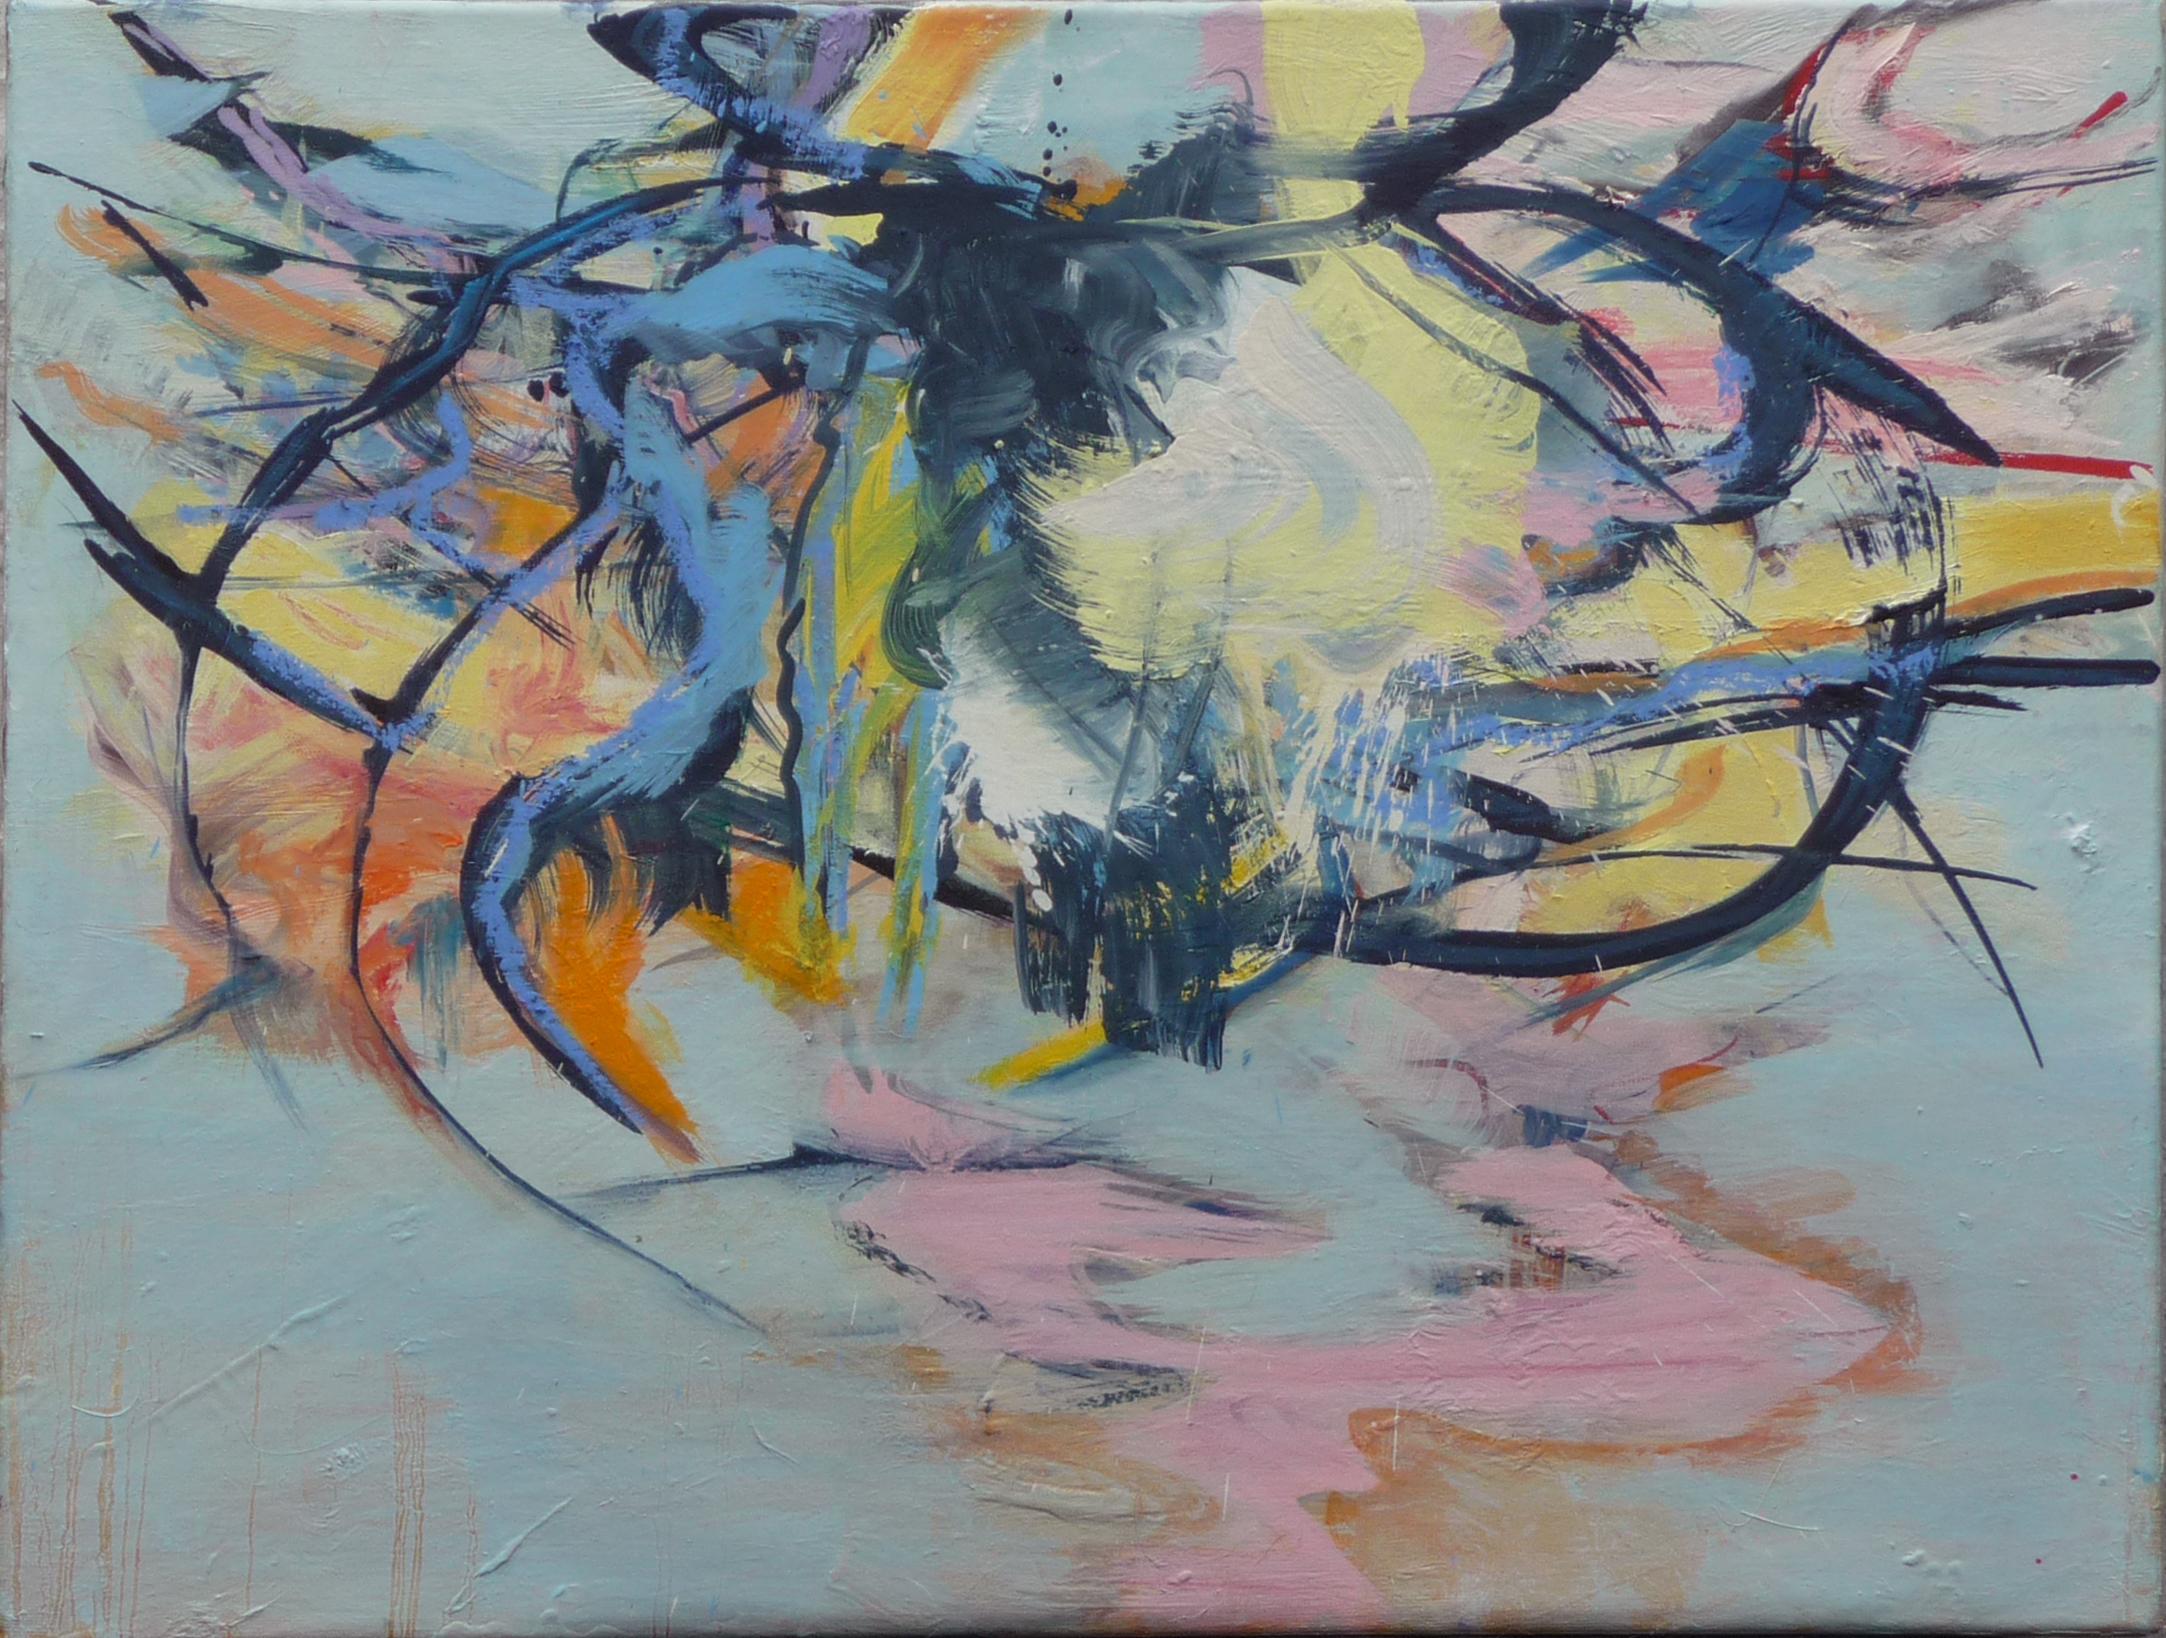 Image 4, olieverf op doek, 60 x 80 cm